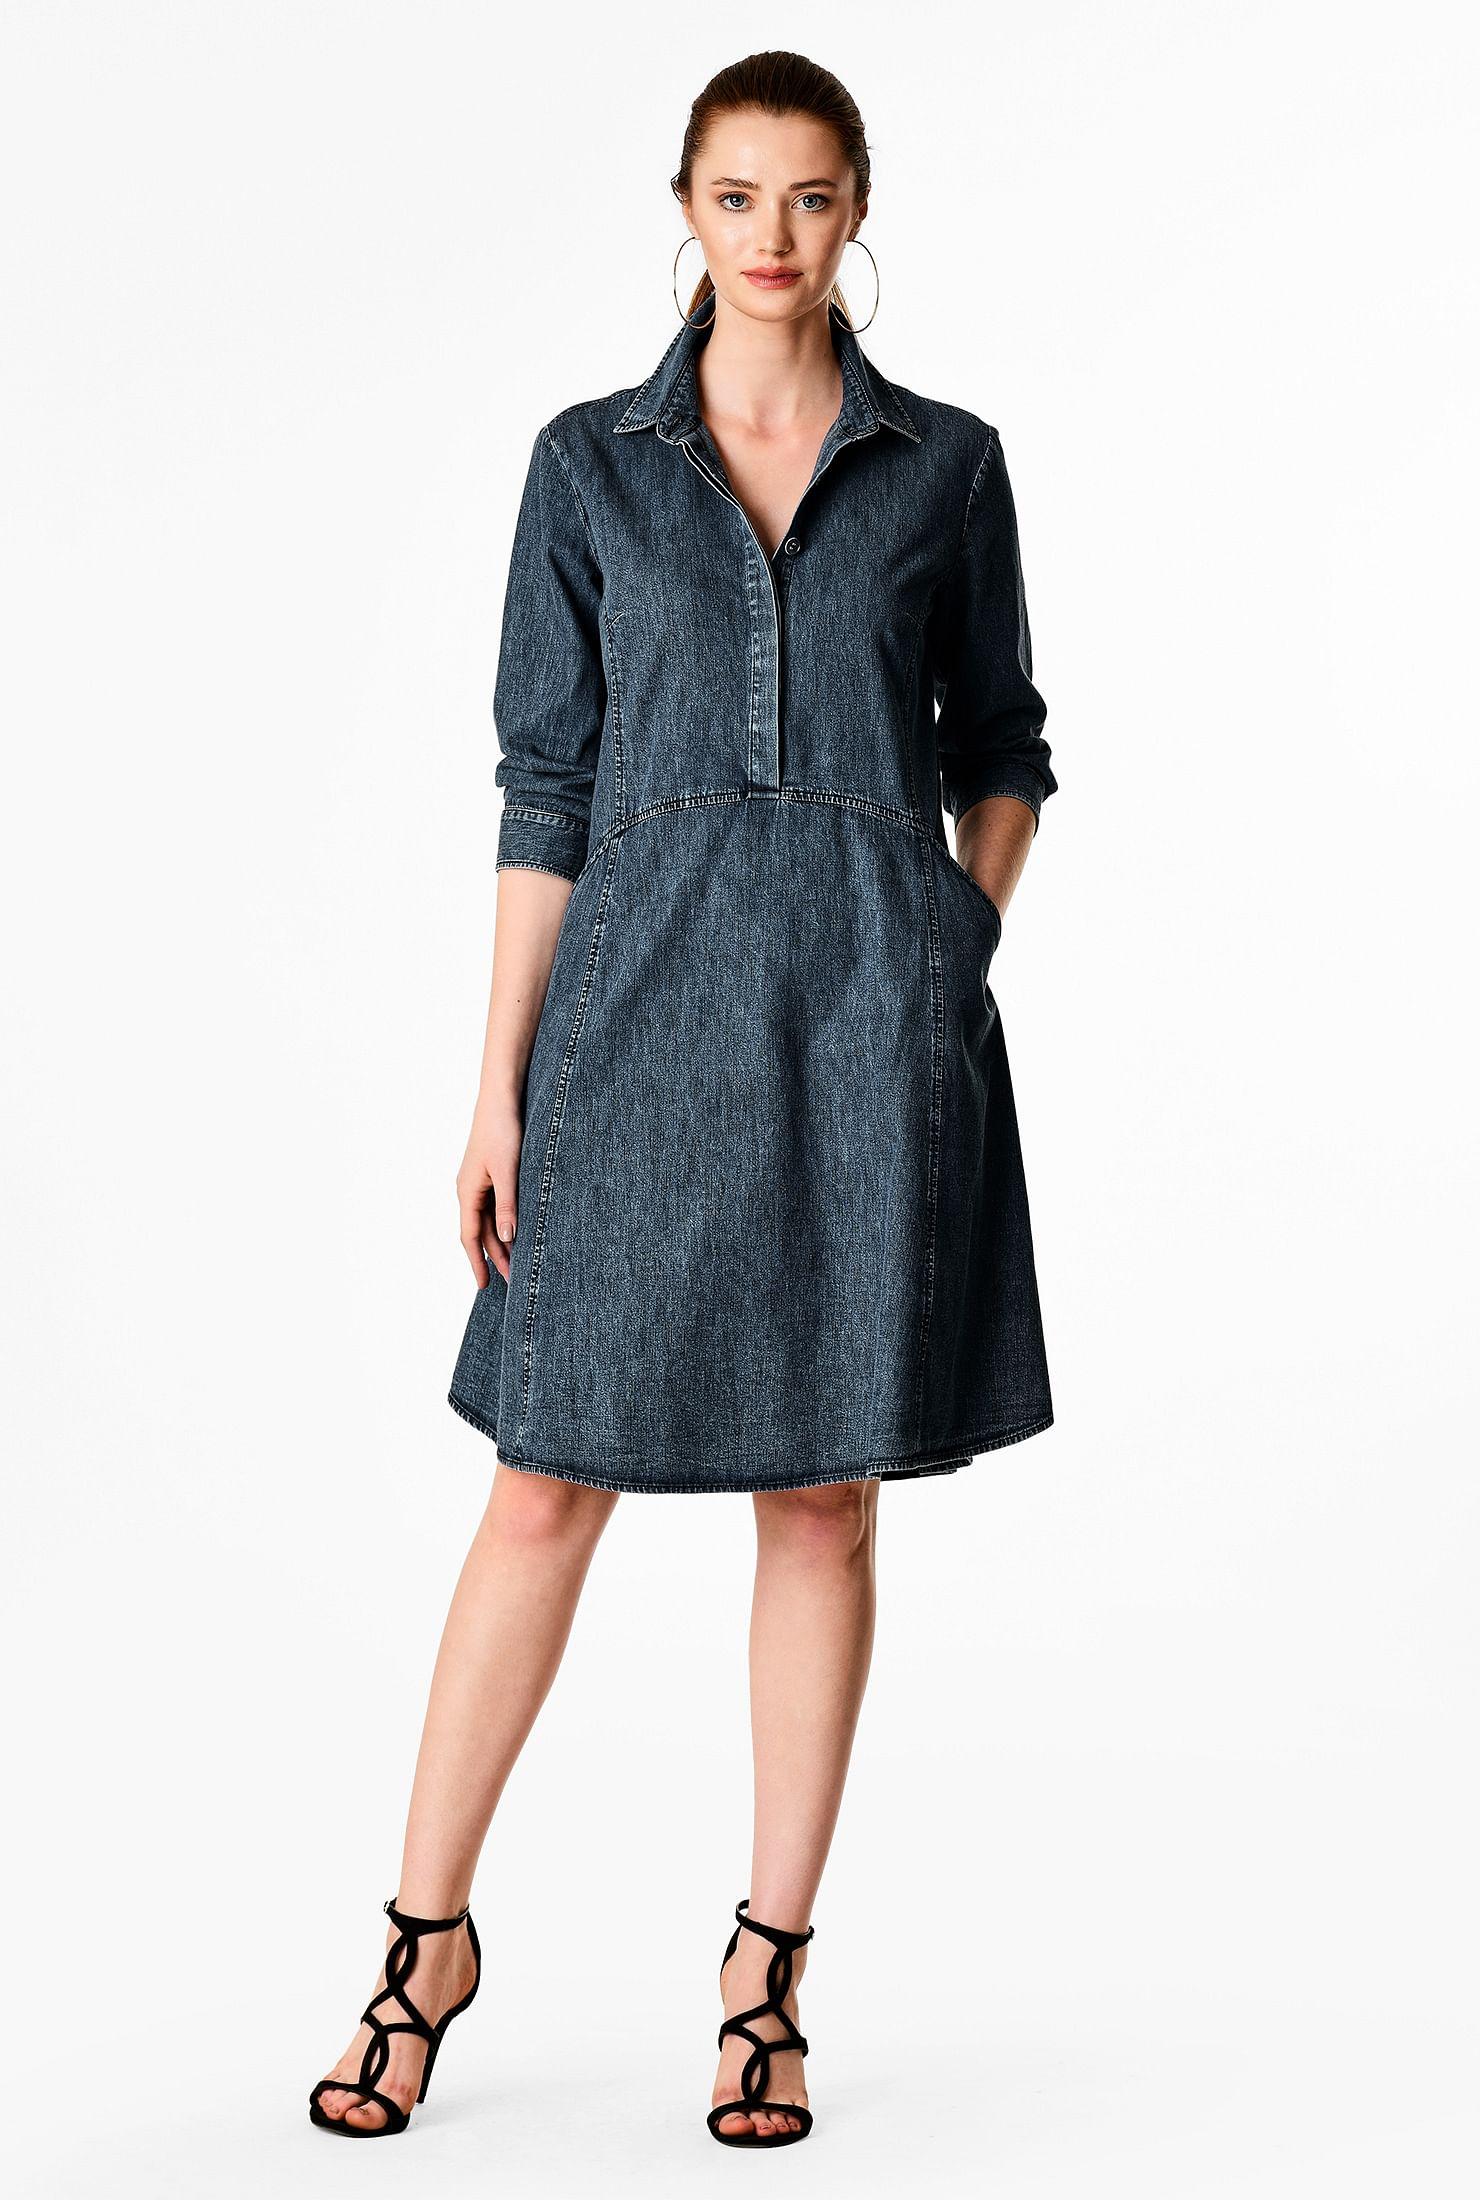 Vintage blue cotton denim shirtdress